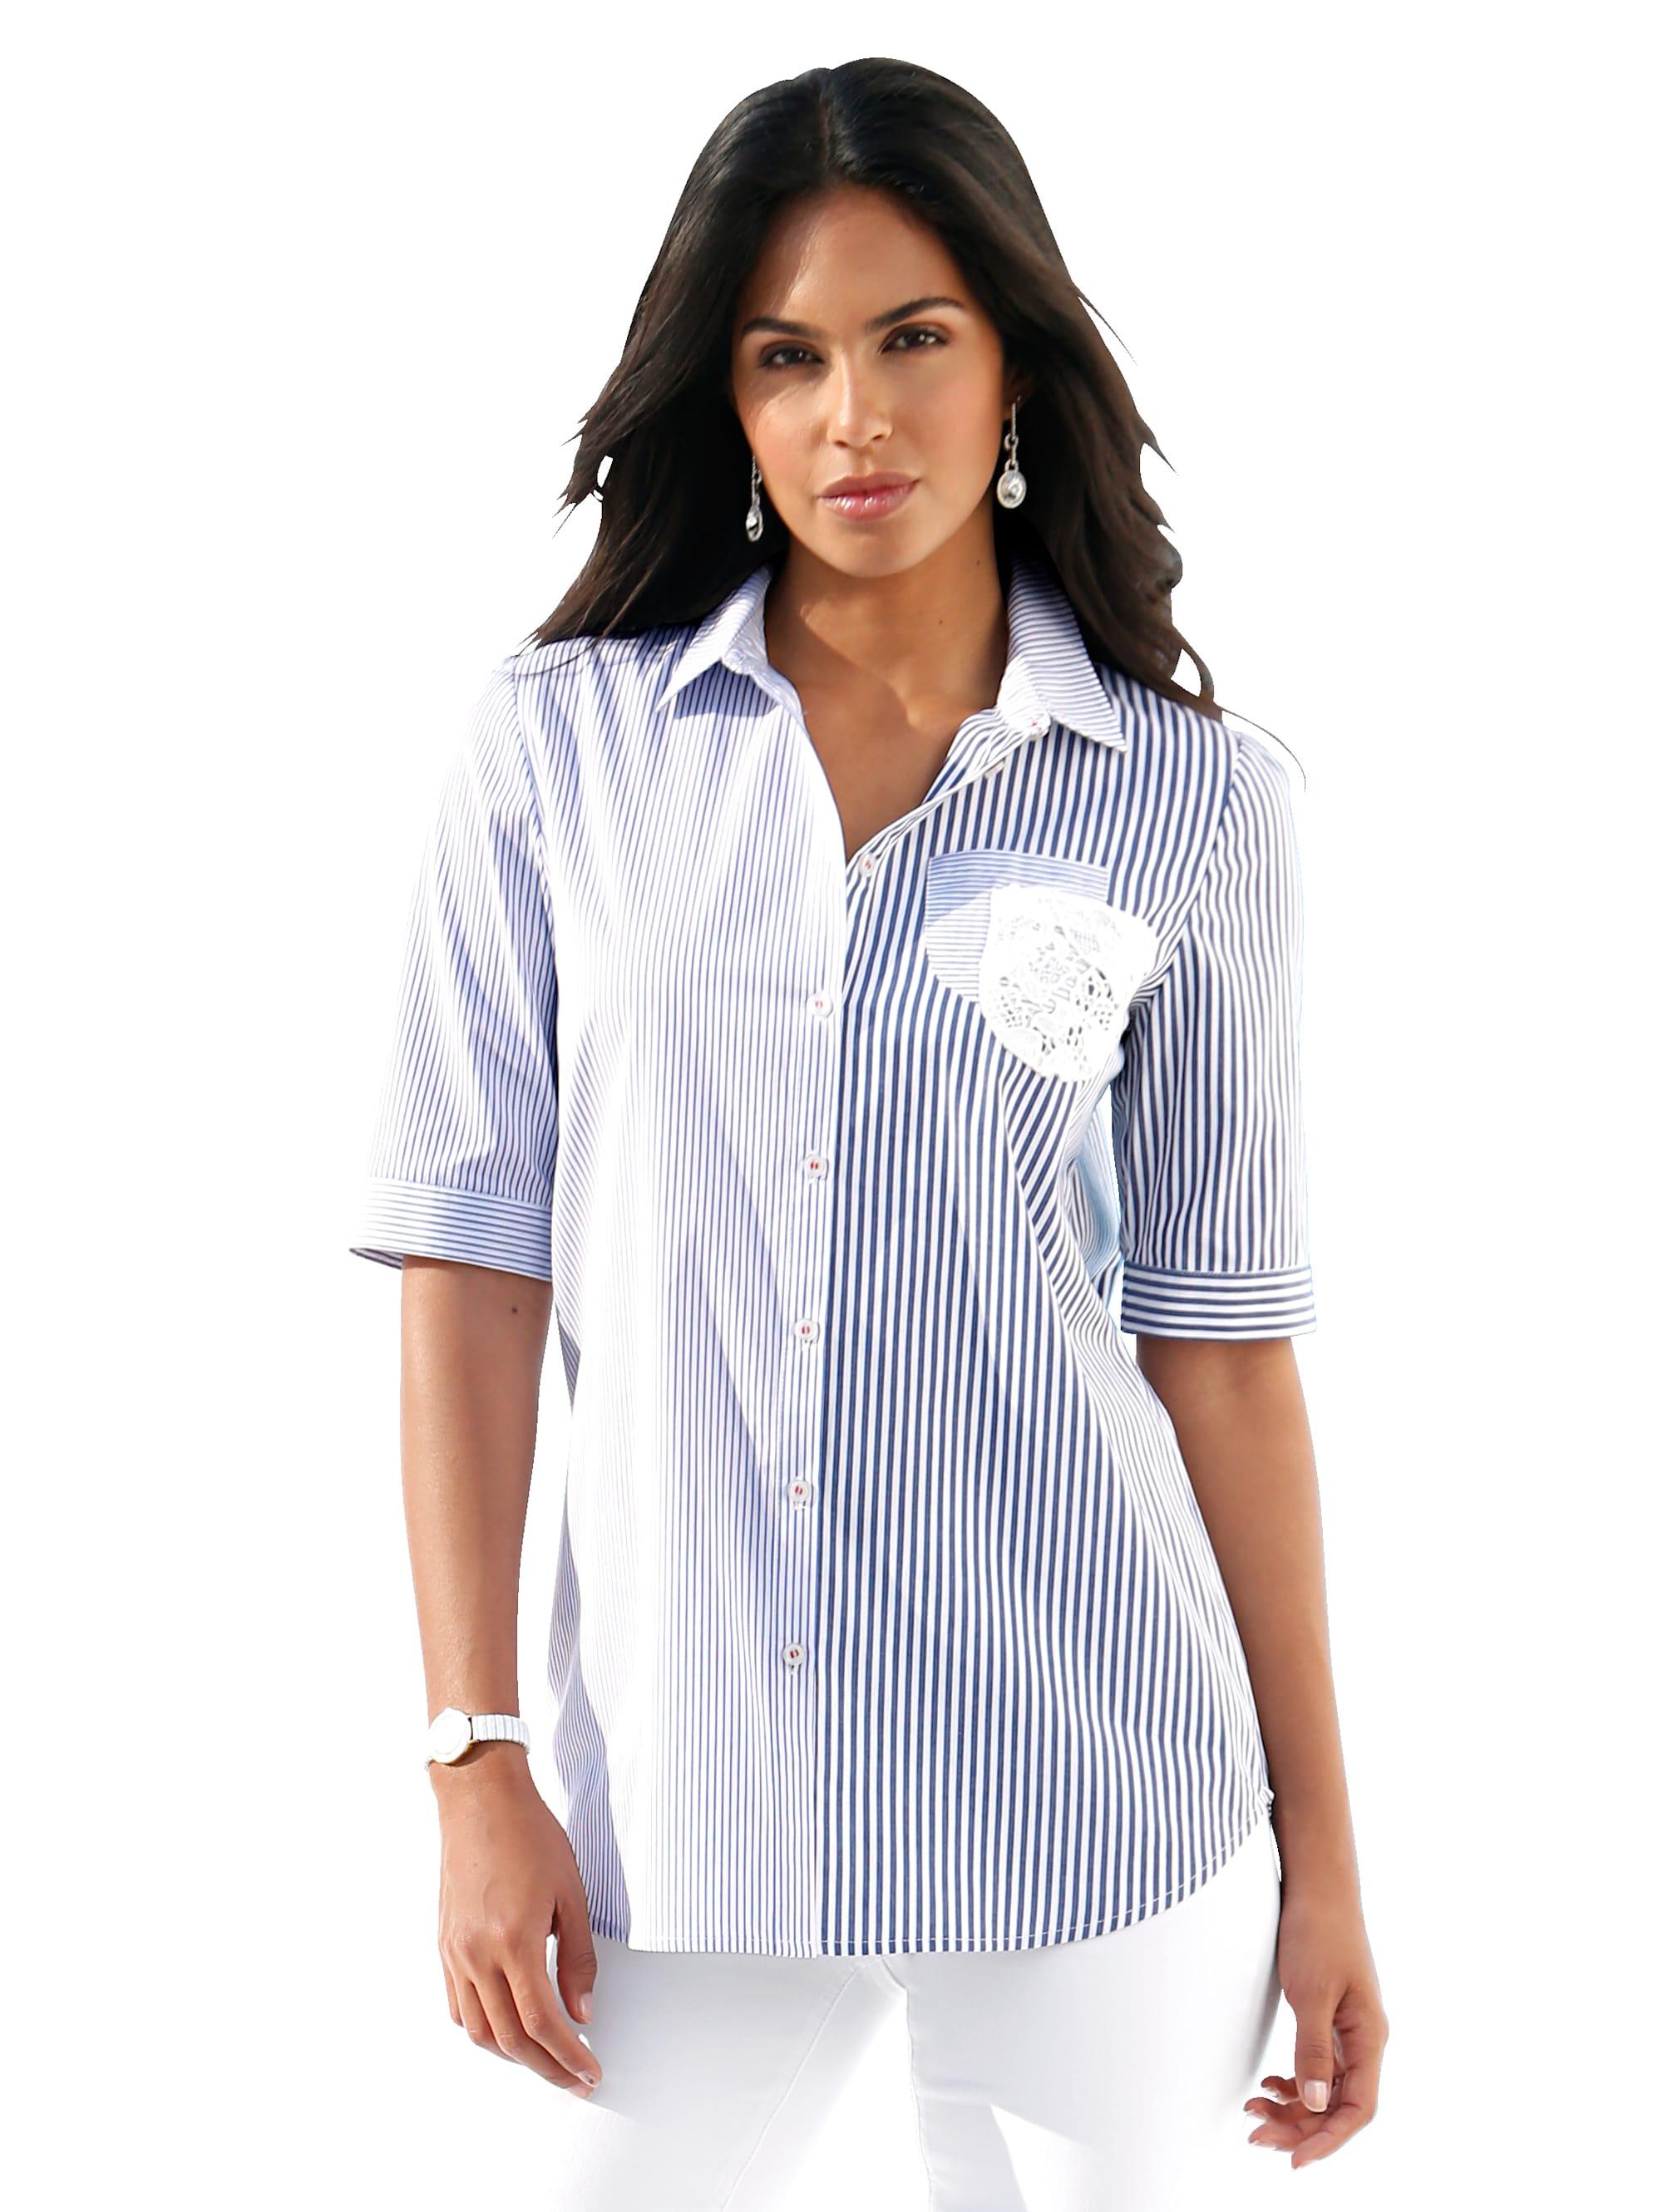 AMY VERMONT Bluse mit transparentem Spitzeneinsatz im Rückteil m5dQk xky7A